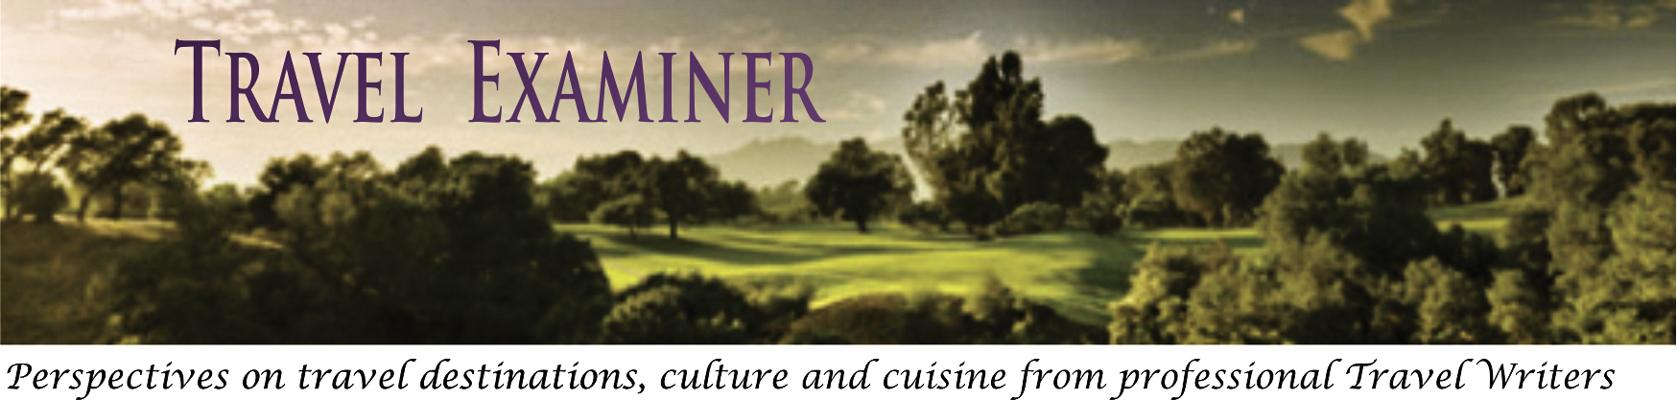 Travel Examiner